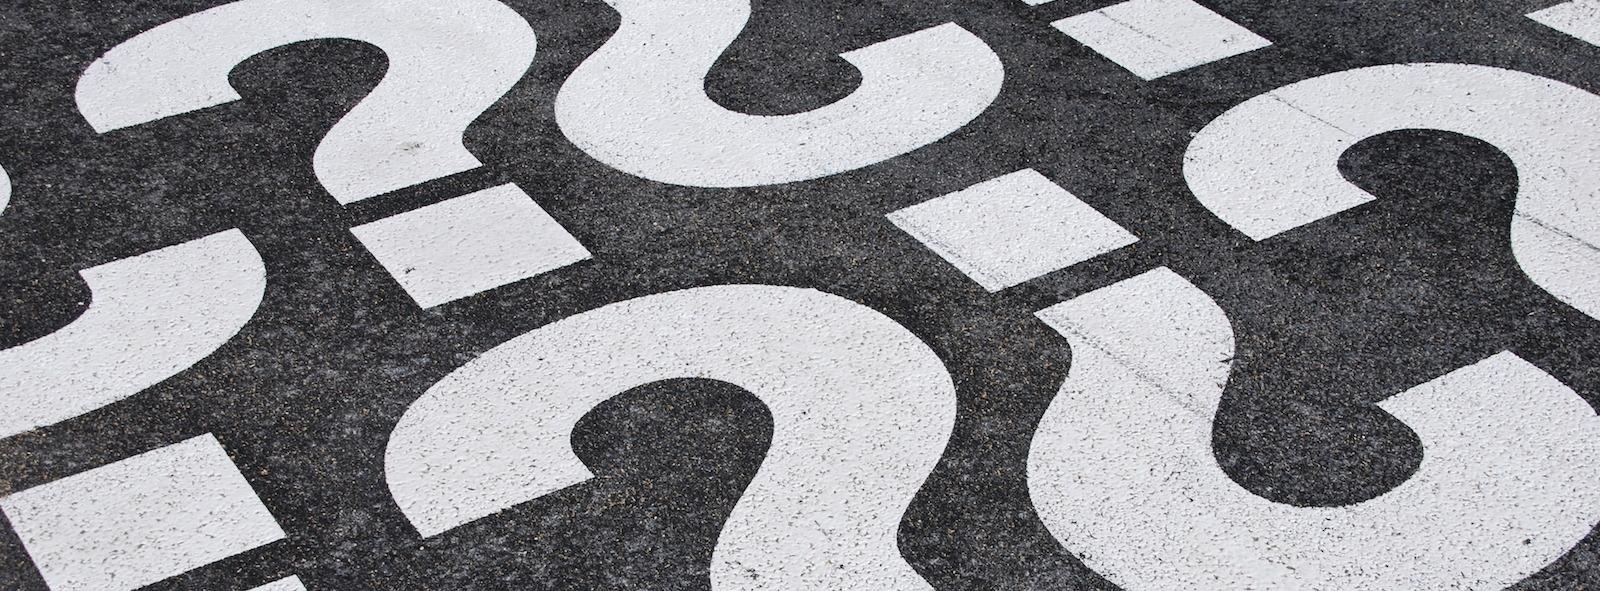 question-mark-sign_QJkoVV.jpg